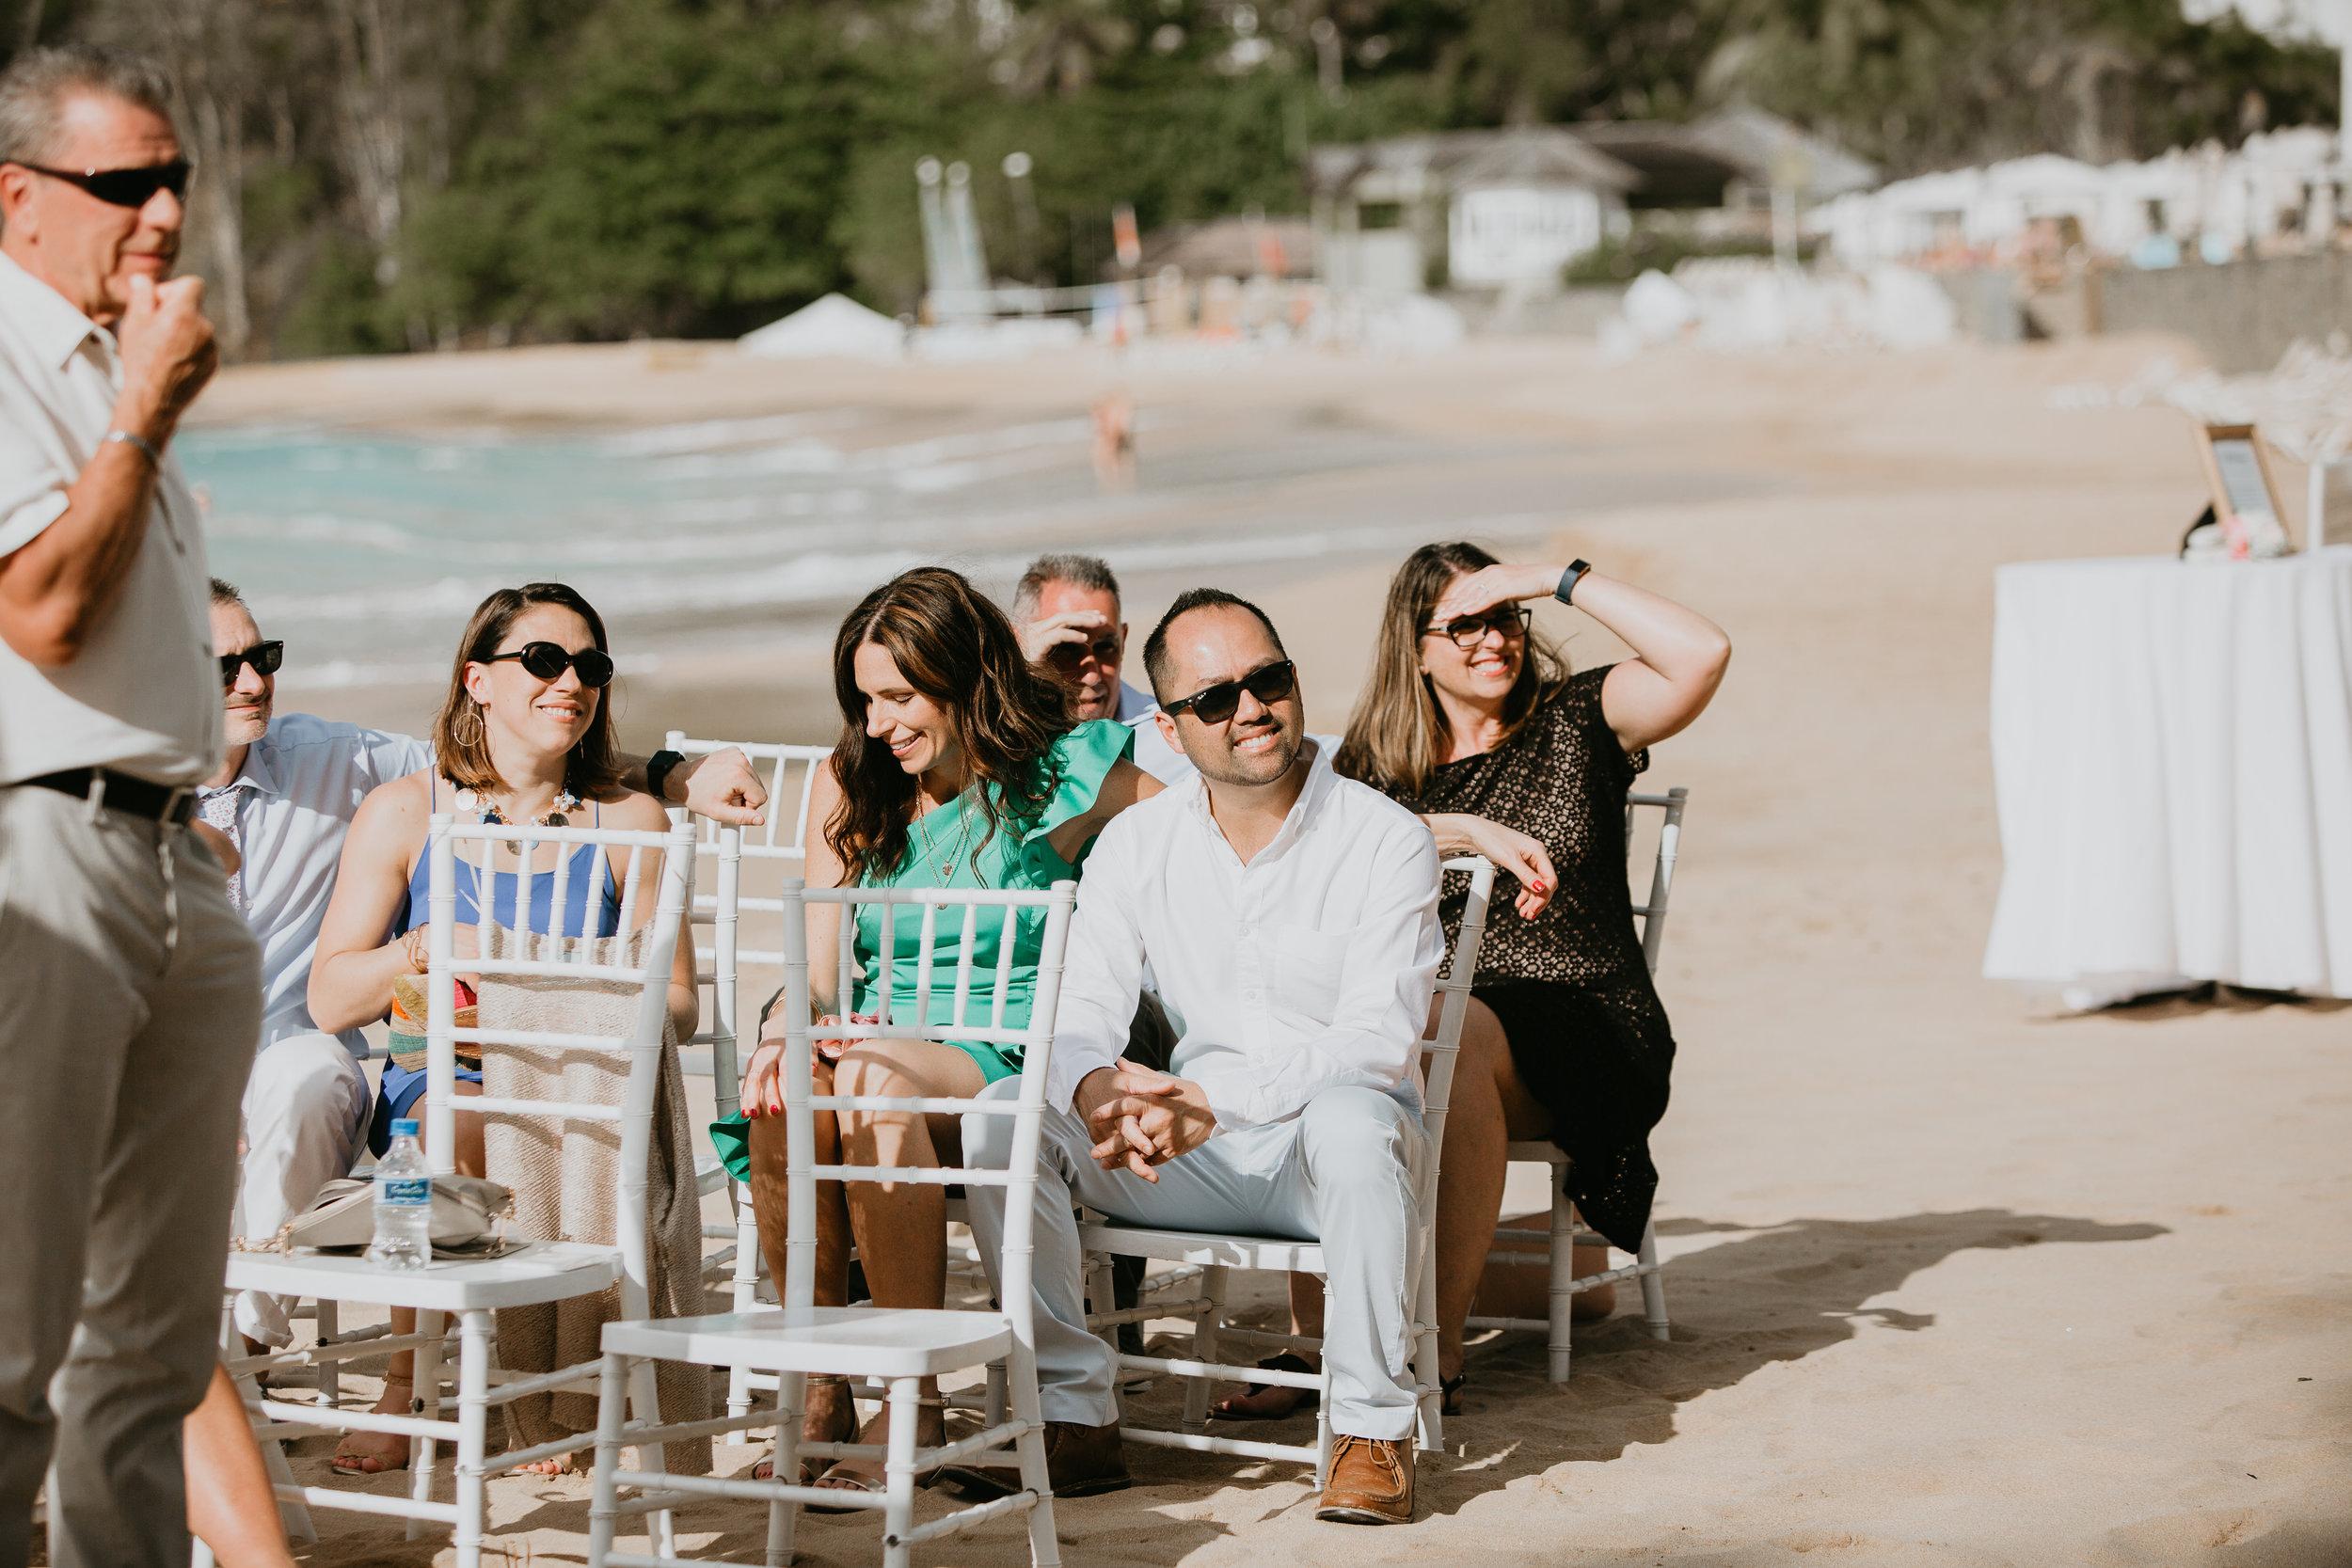 nicole-daacke-photography-destination-wedding-in-st-lucia-sandals-la-toc-intimate-island-wedding-carribean-elopement-photographer-chill-island-wedding-48.jpg